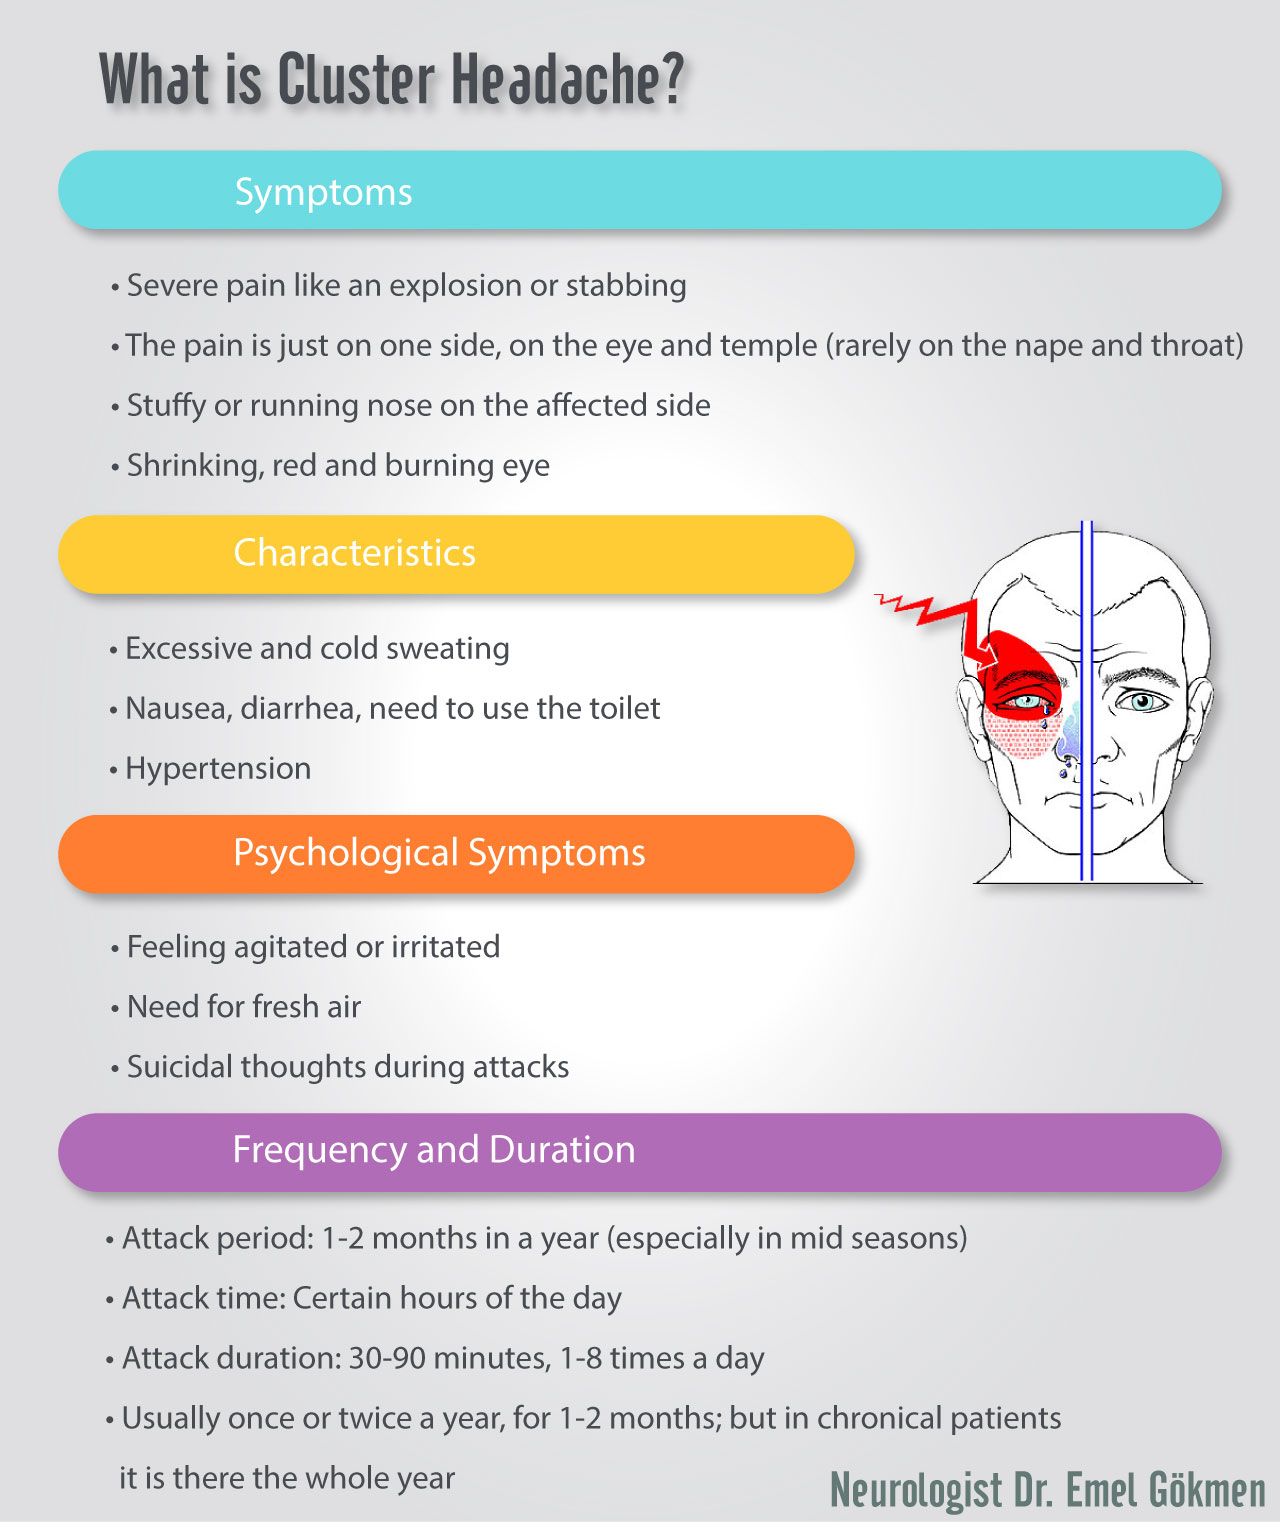 Cluster headache infographic Dr. Emel Gokmen